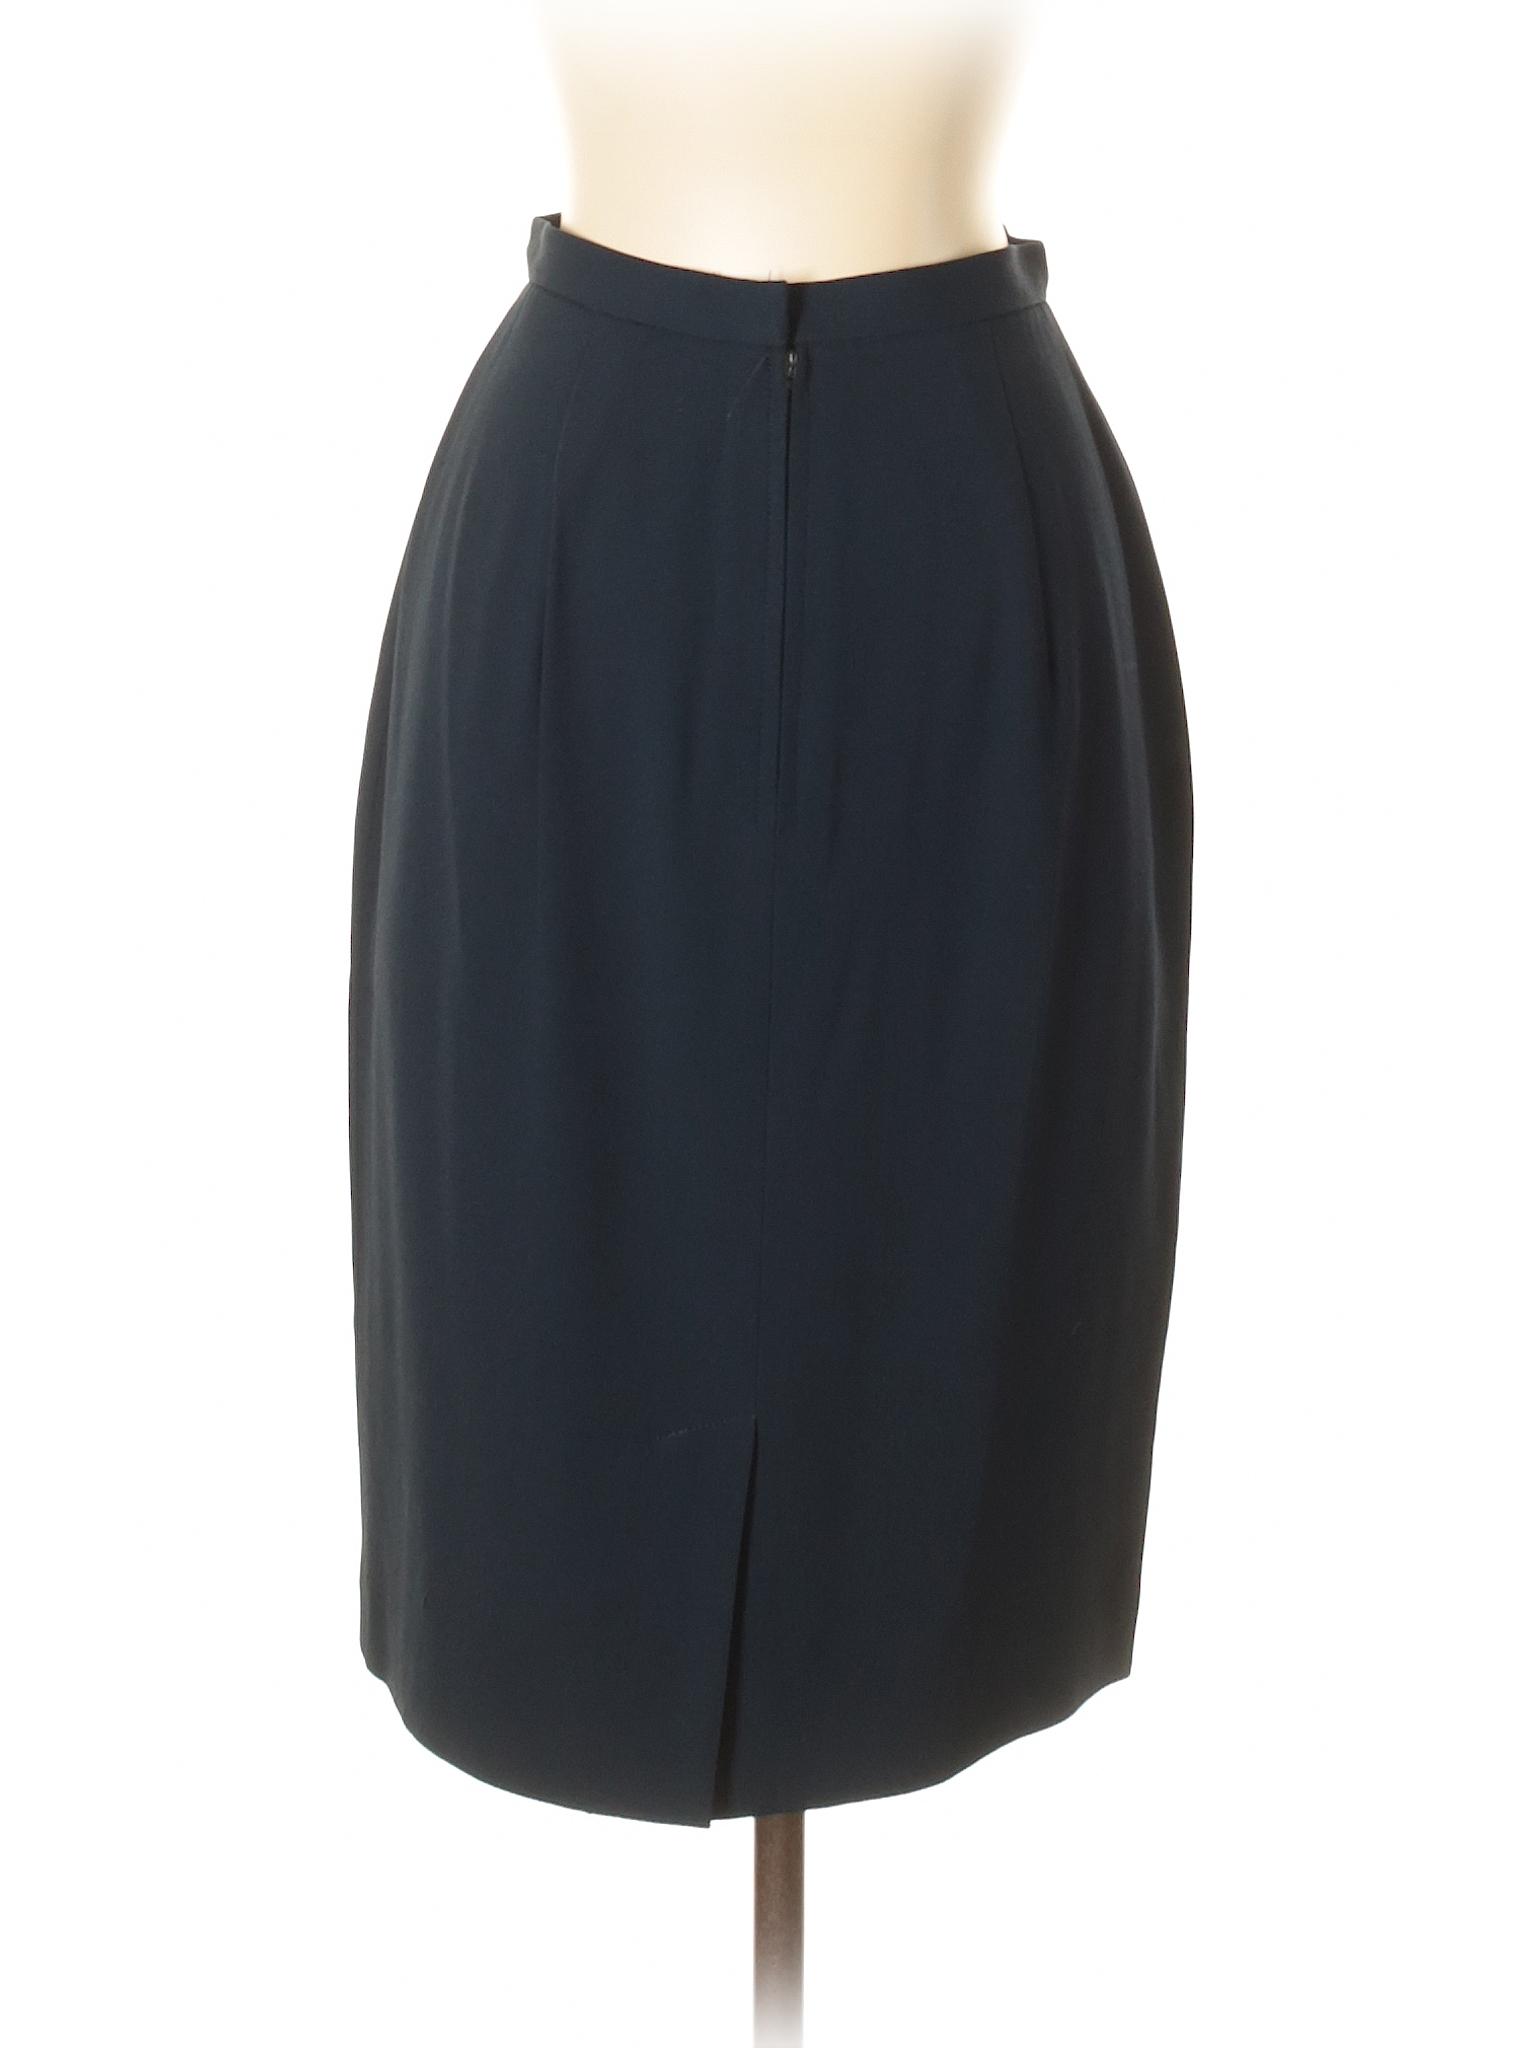 Taylor Ann Boutique Ann Boutique Skirt Skirt Taylor Formal Boutique Taylor Skirt Formal Boutique Ann Formal wA7SvxqP